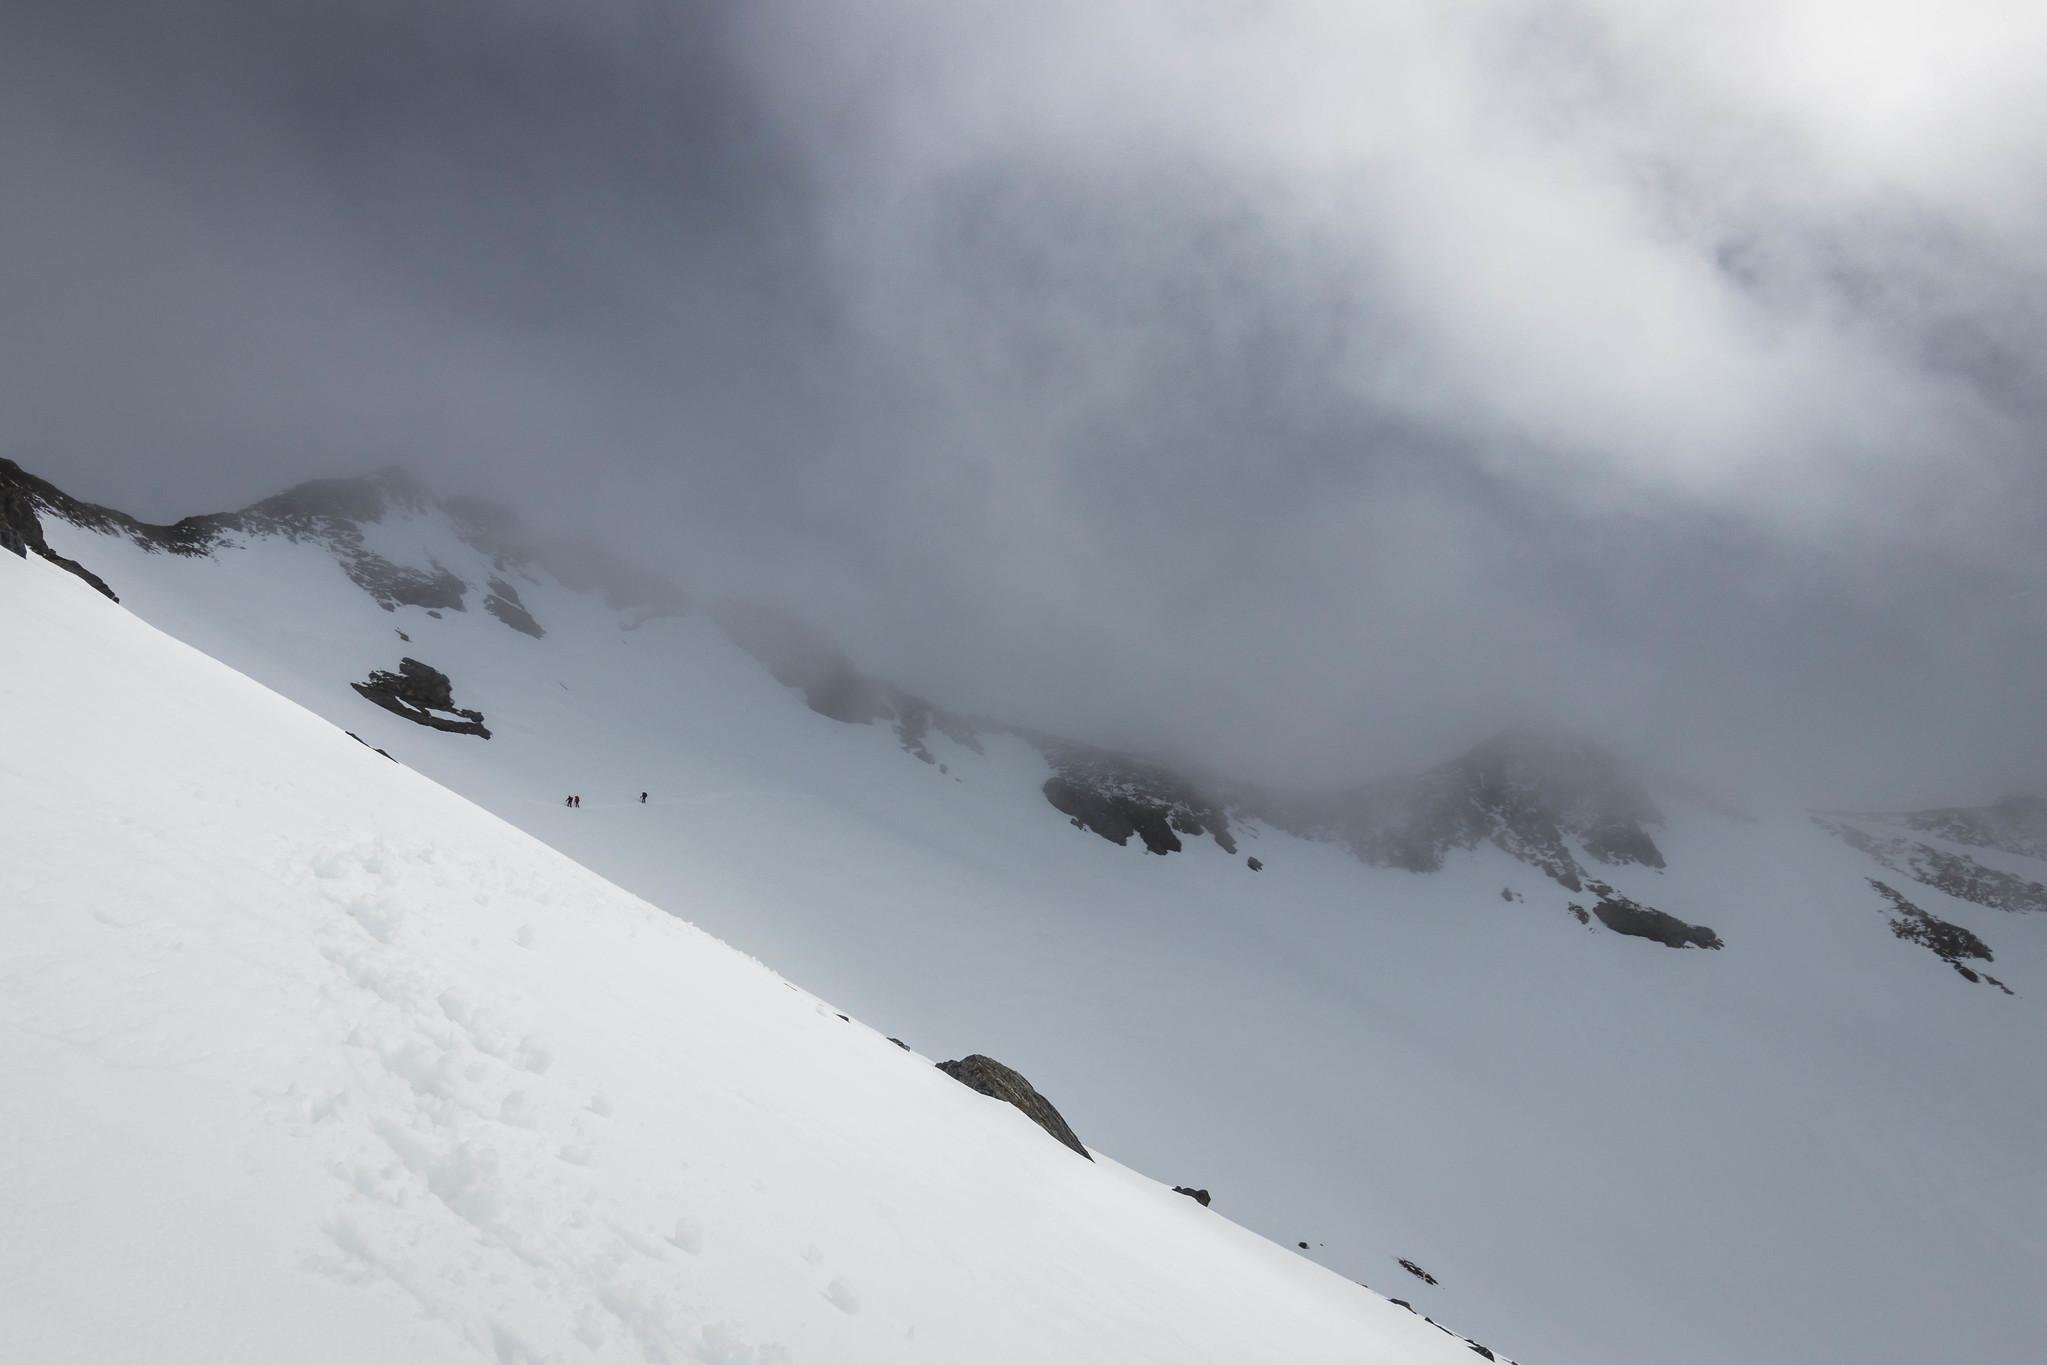 Climbers descending